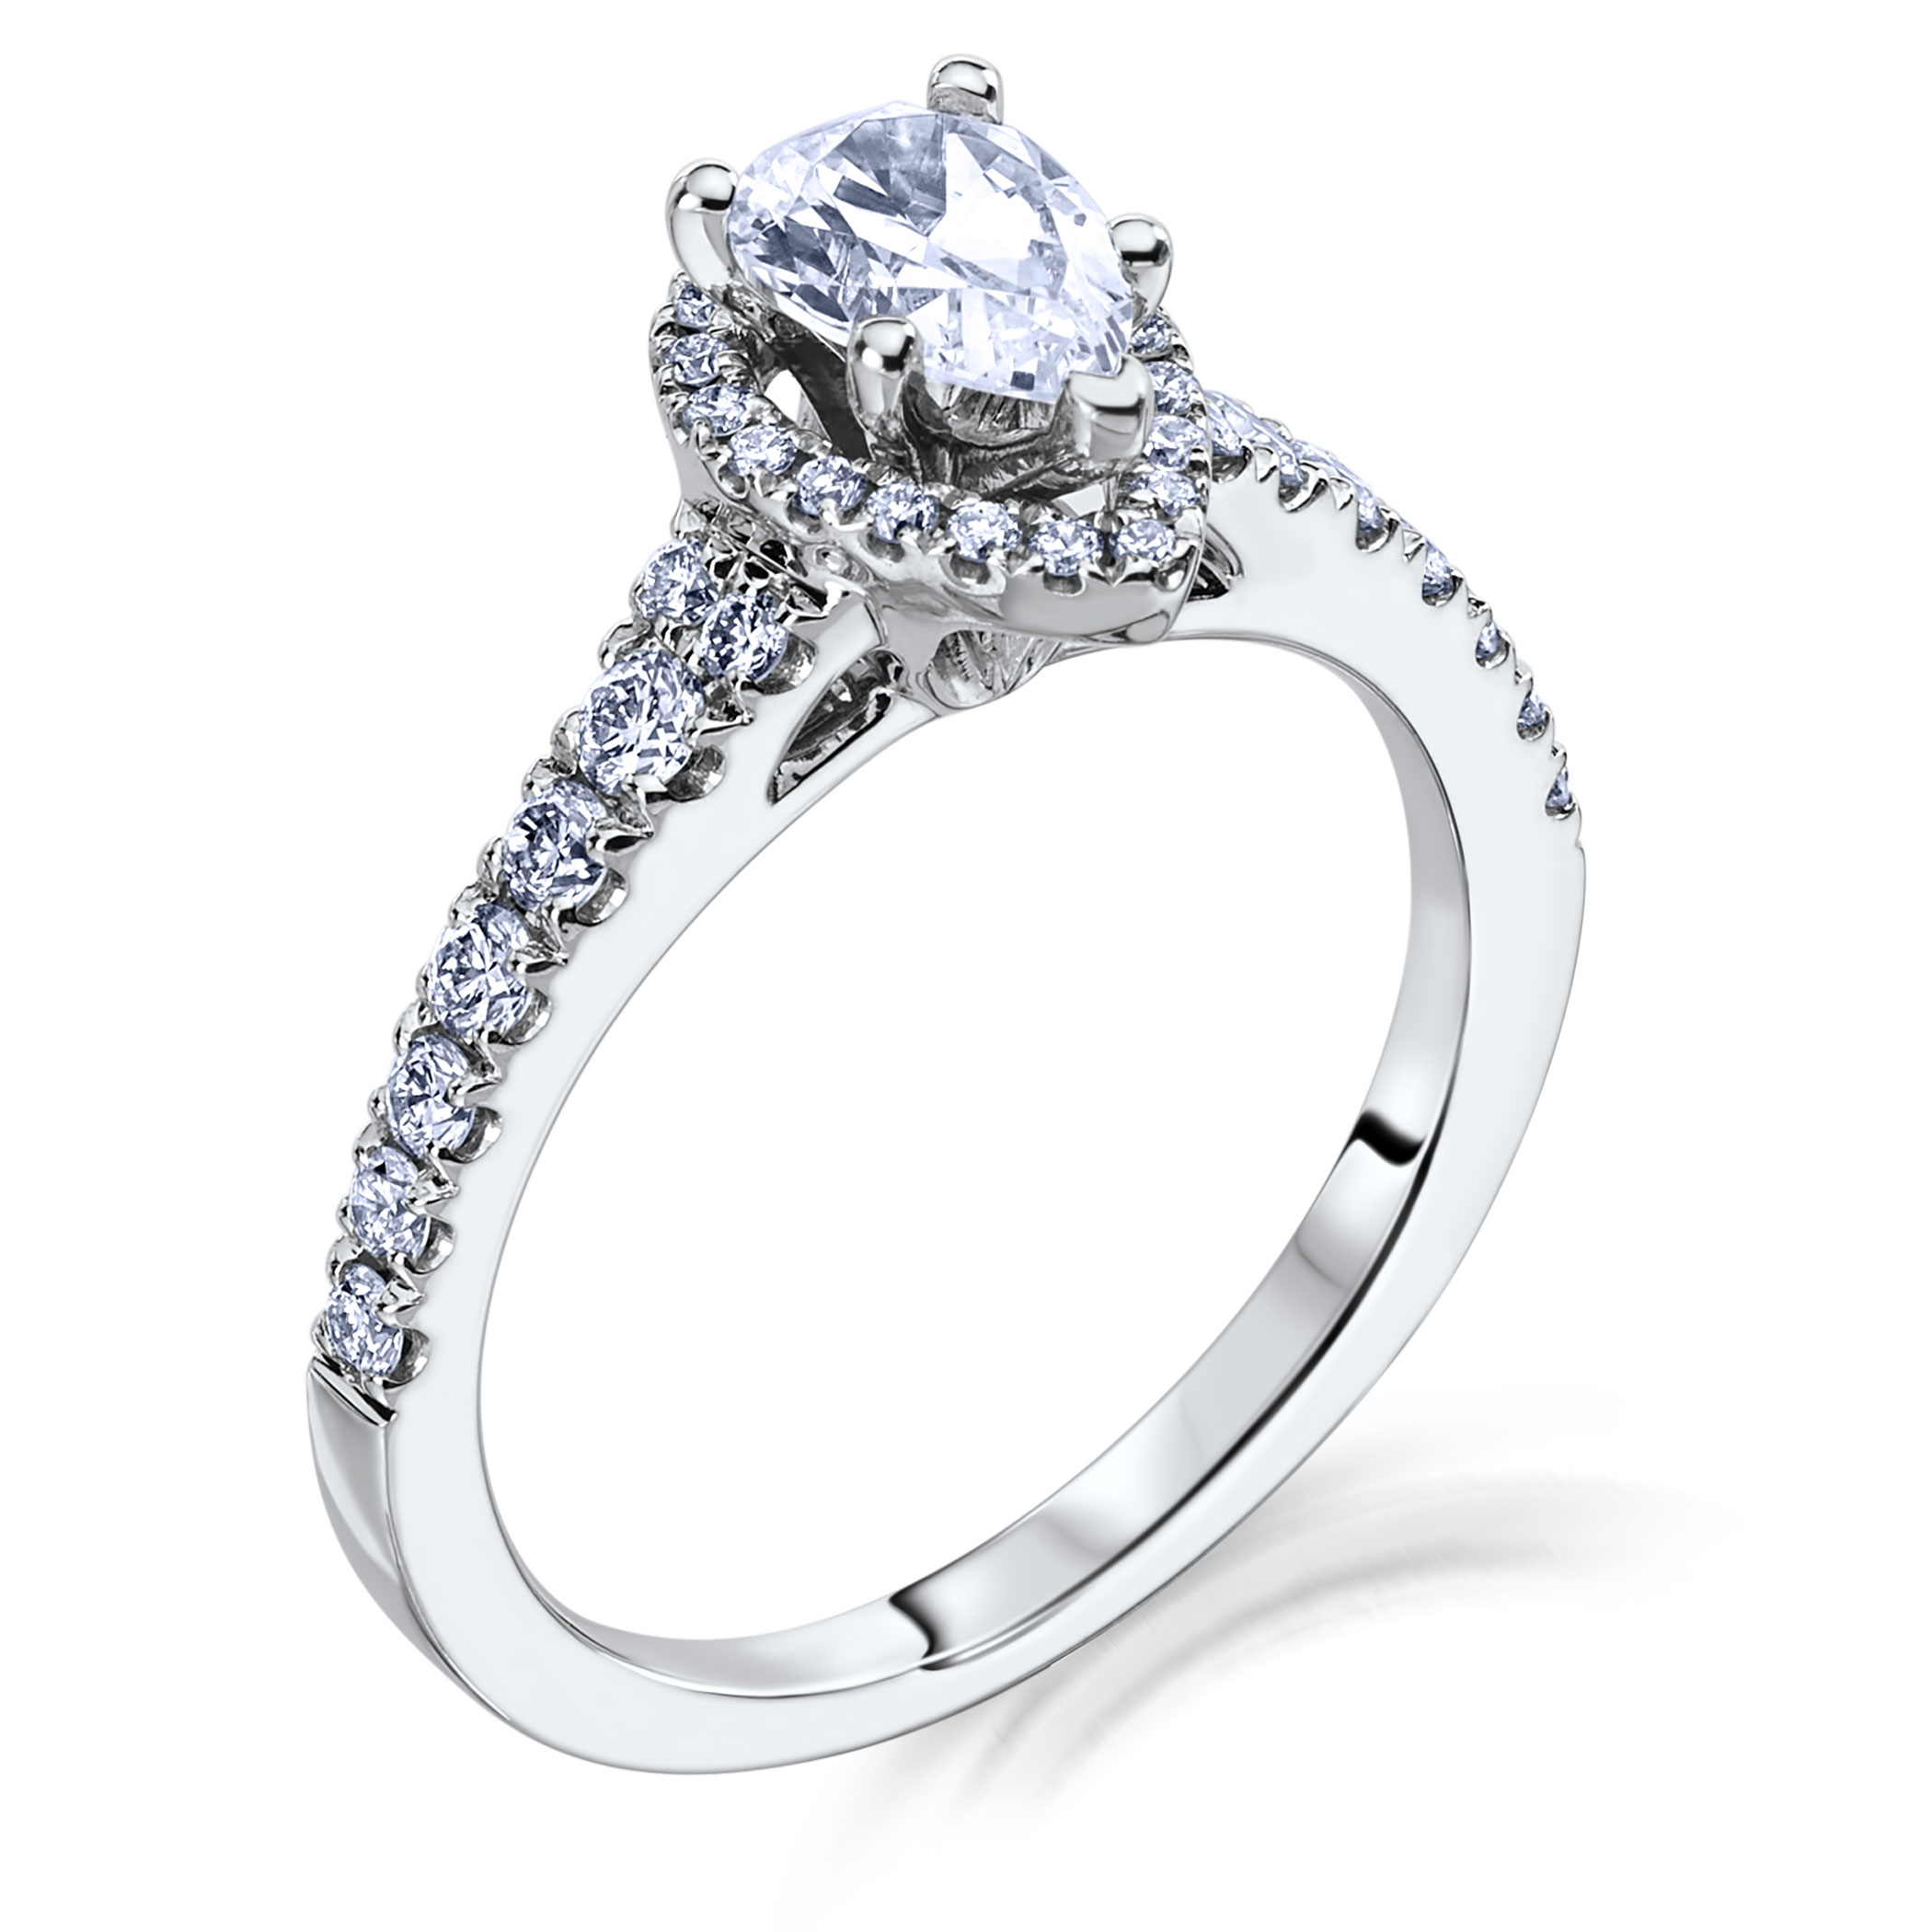 scott kay luminaire engagement ring m1649r510mm - Scott Kay Wedding Rings